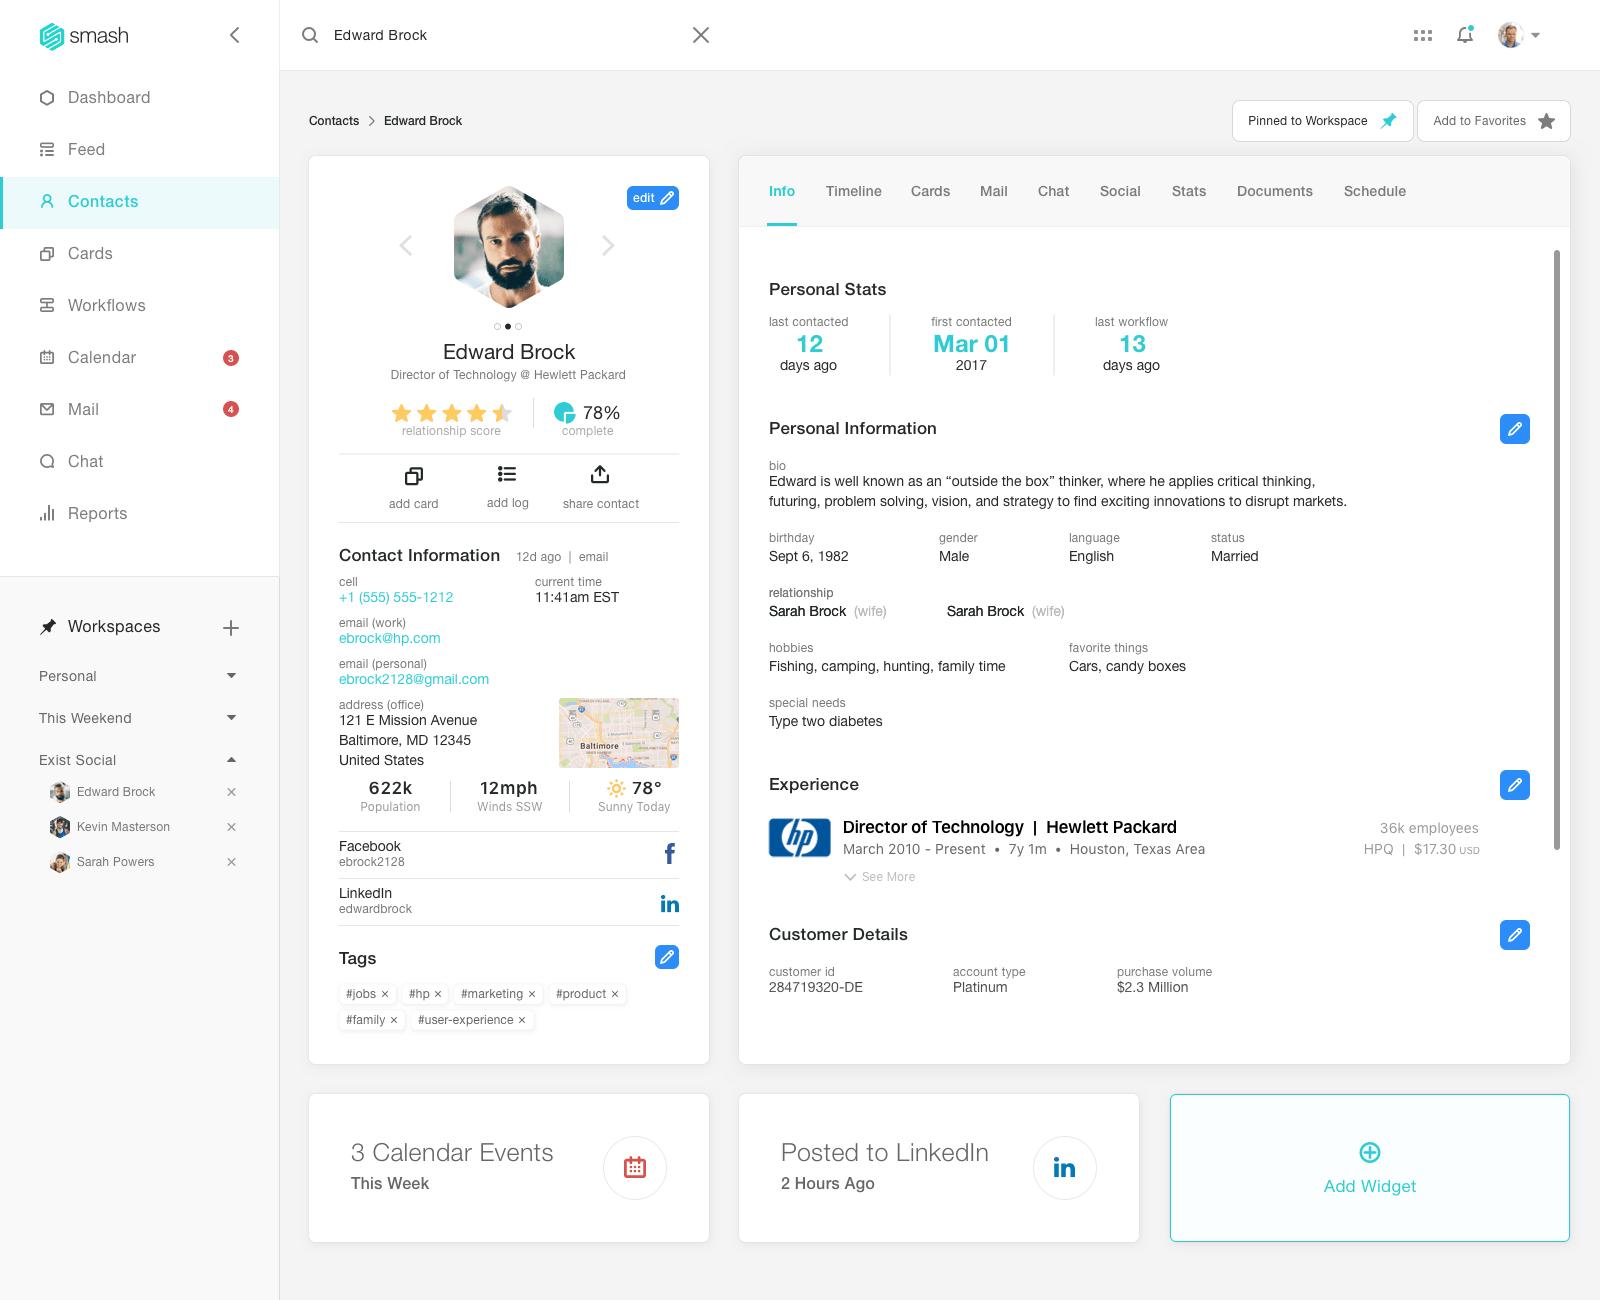 Smash desktop interface